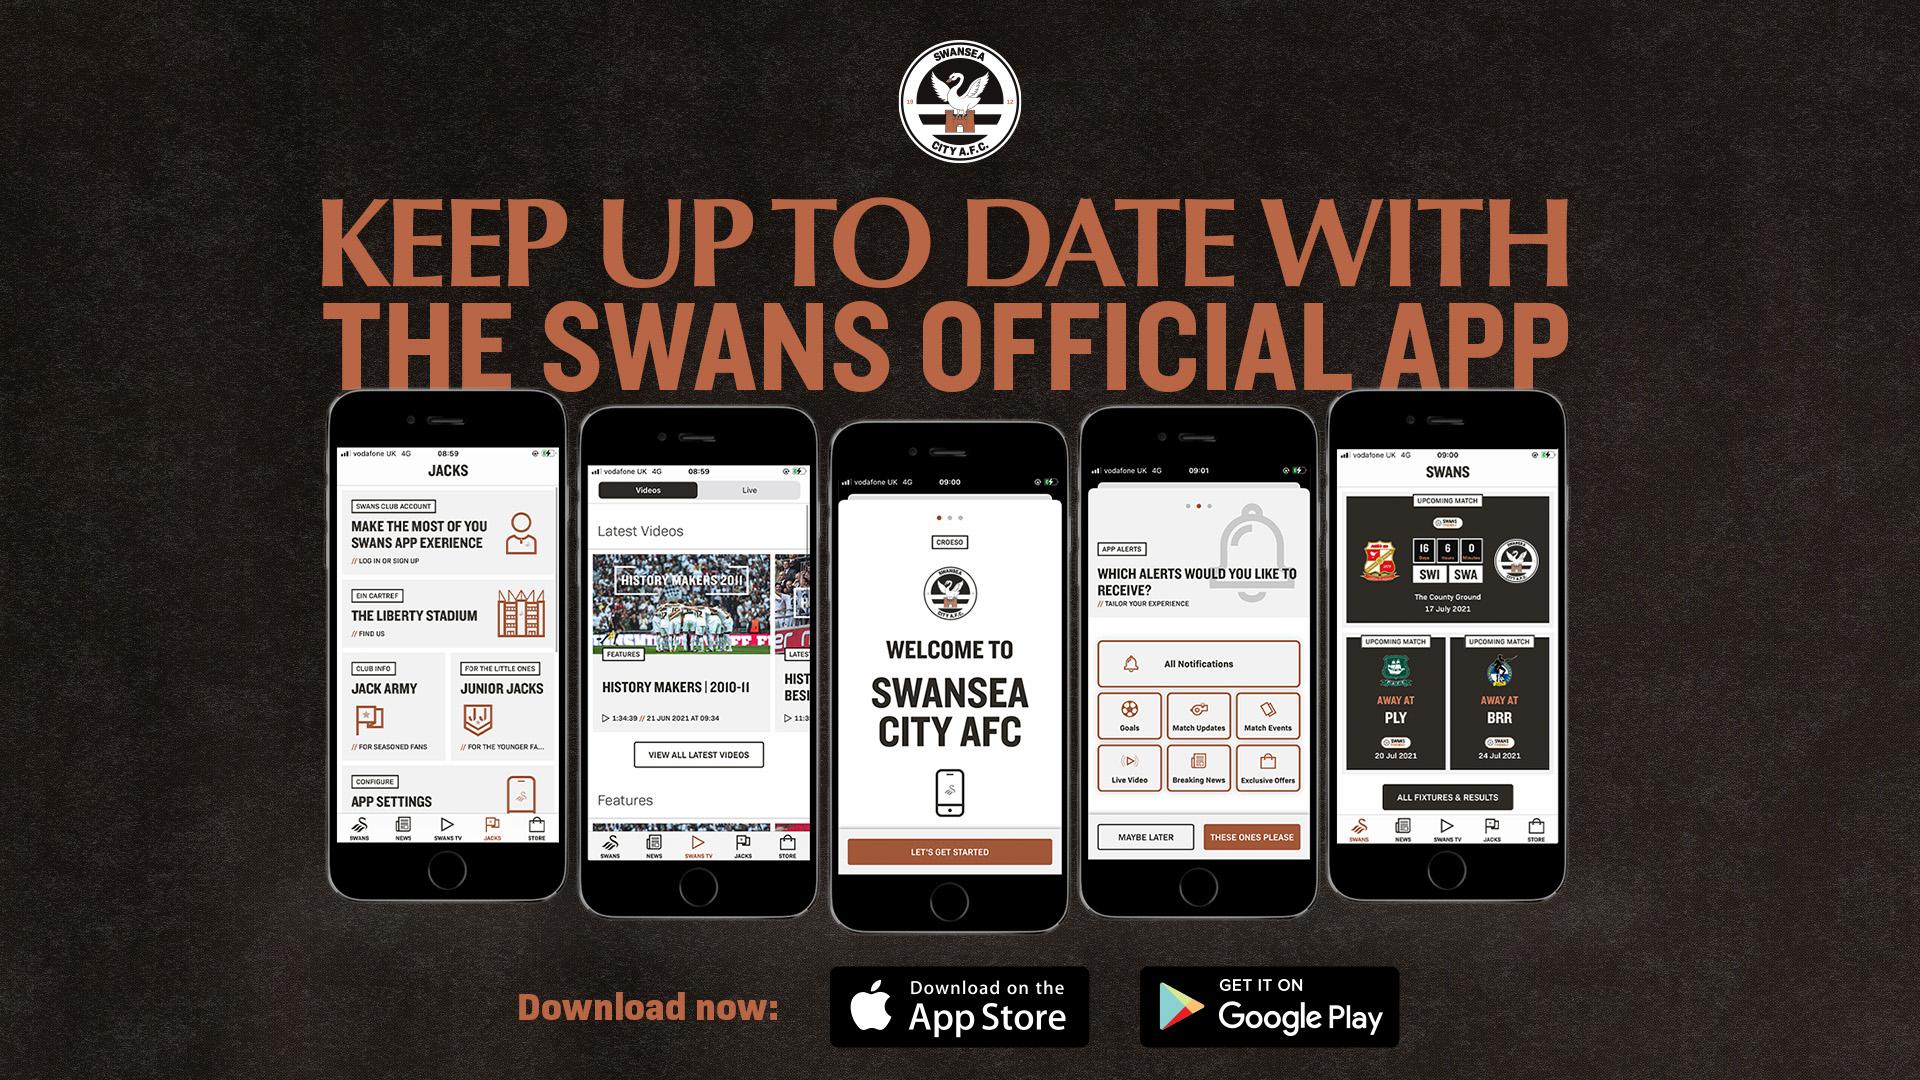 New Swans app 2